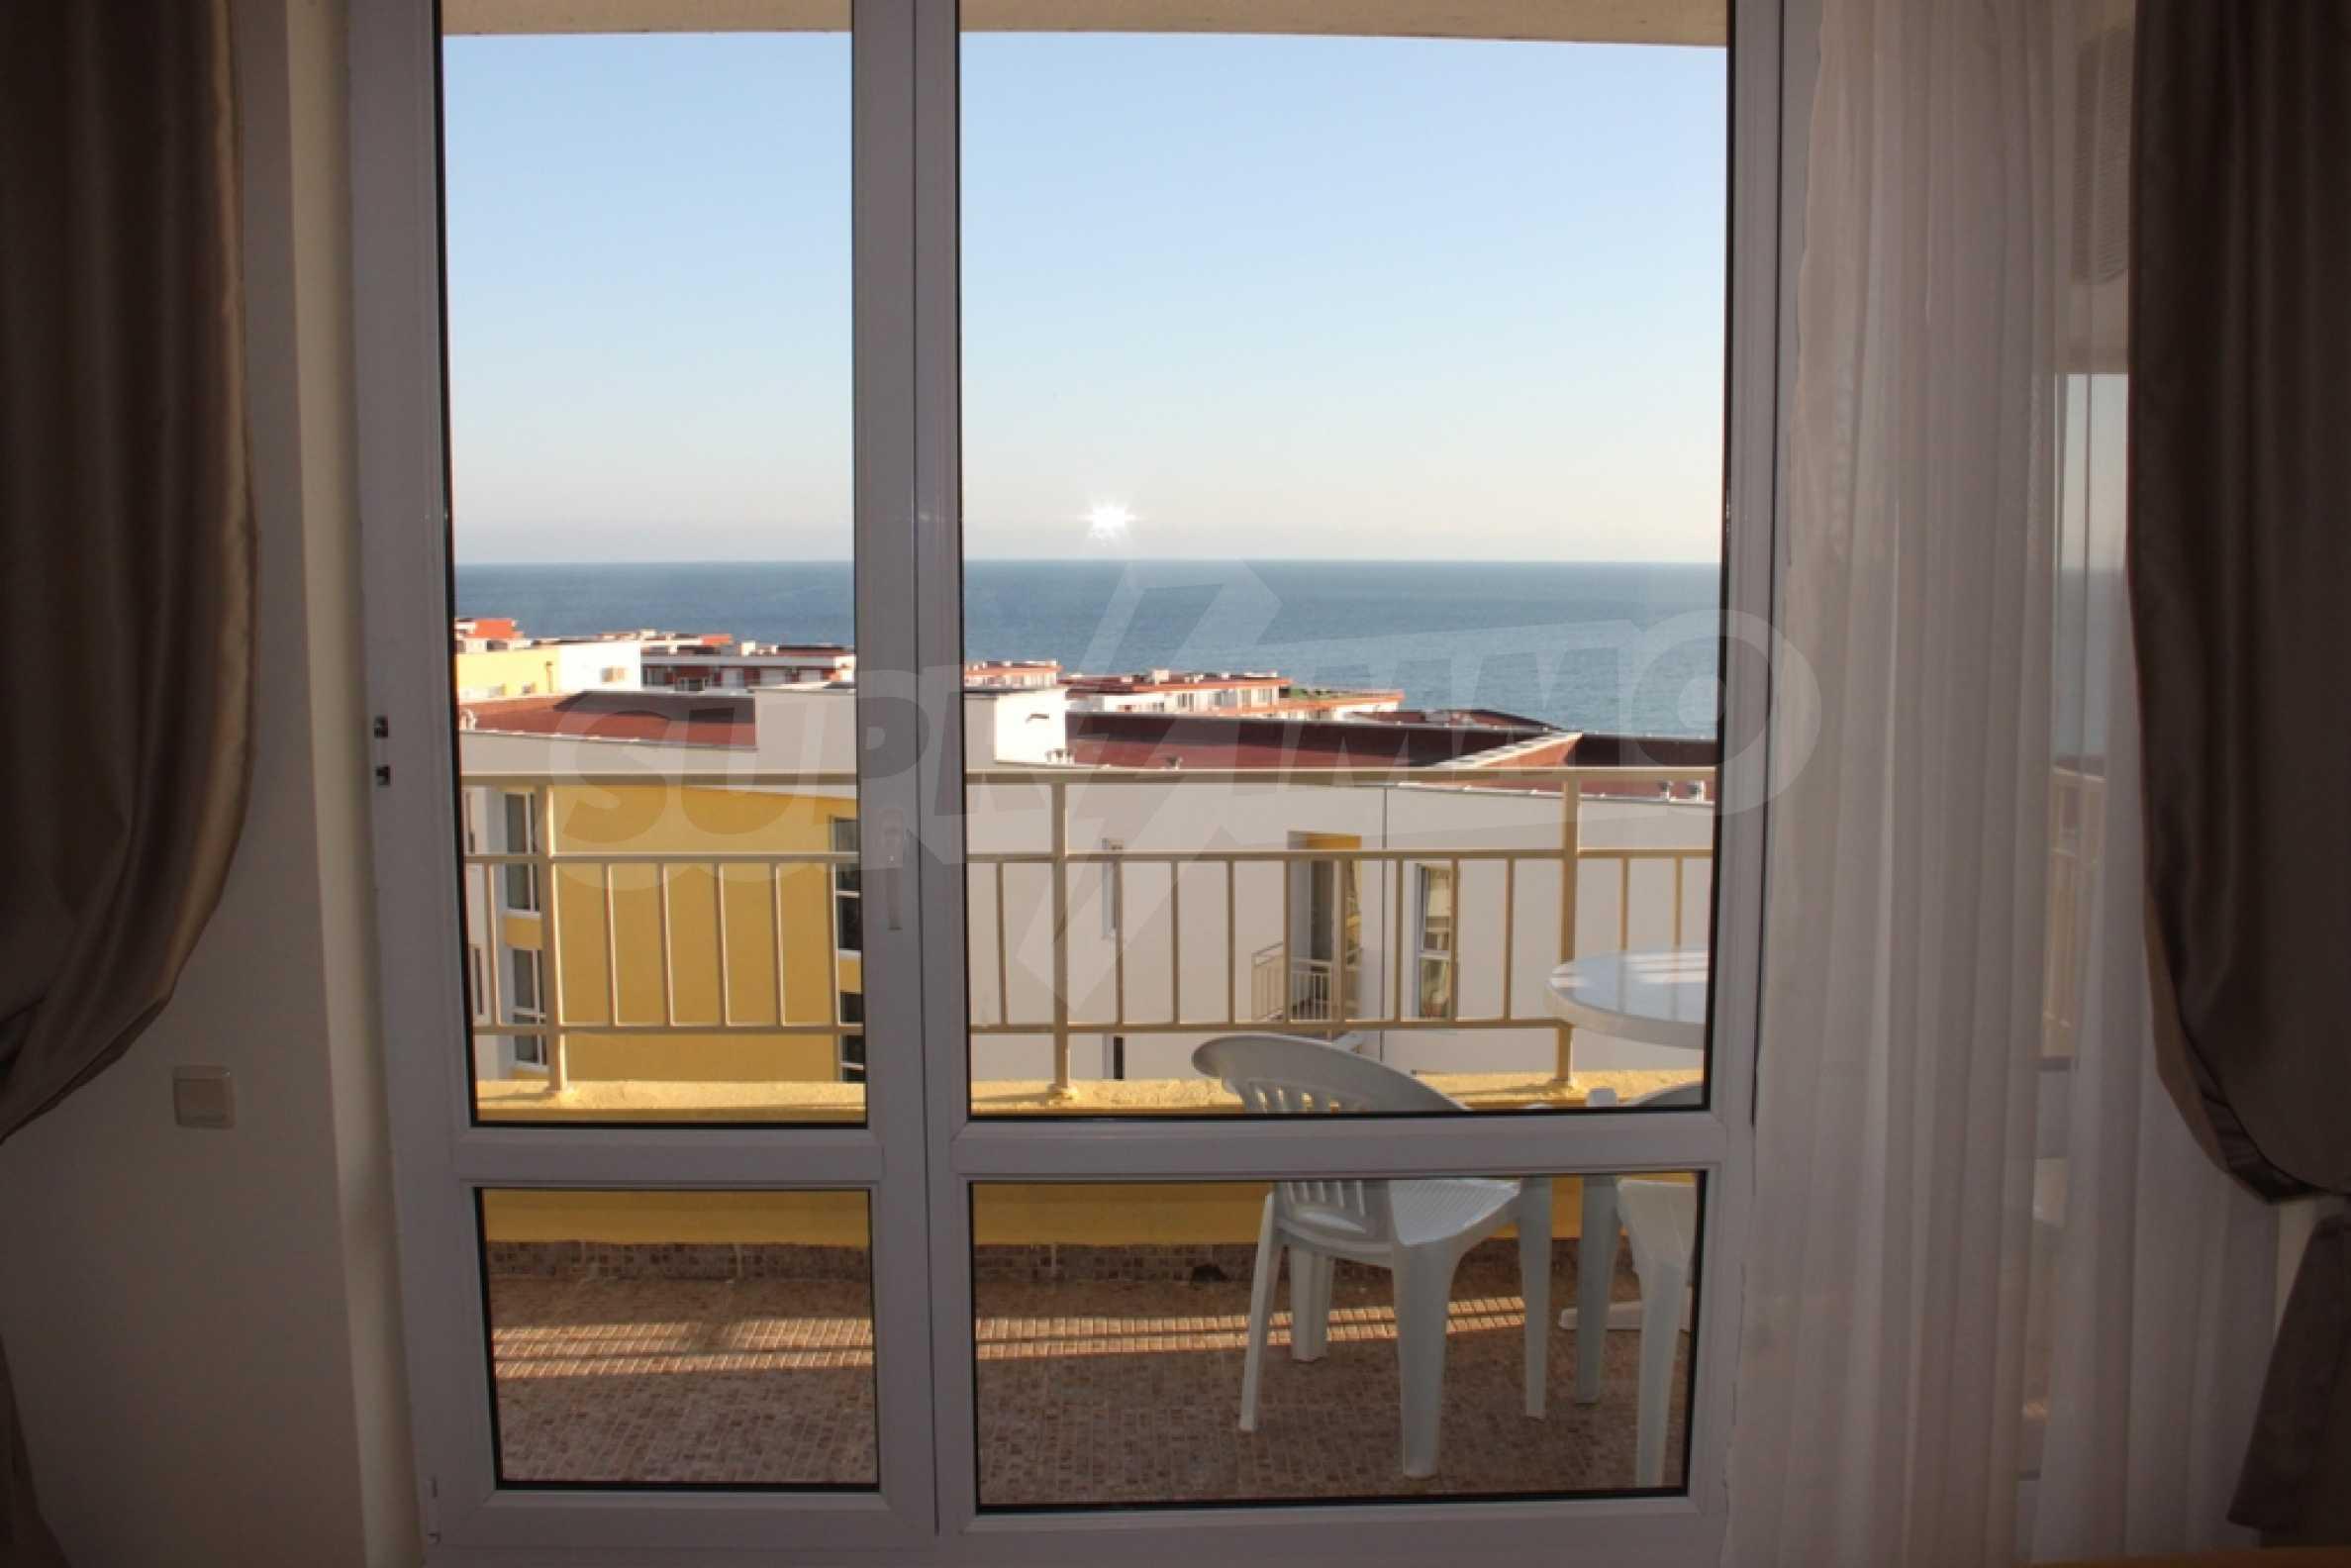 1-bedroom apartment for sale in Sveti Vlas, Bulgaria - Sales - 1-bedroom apartment.